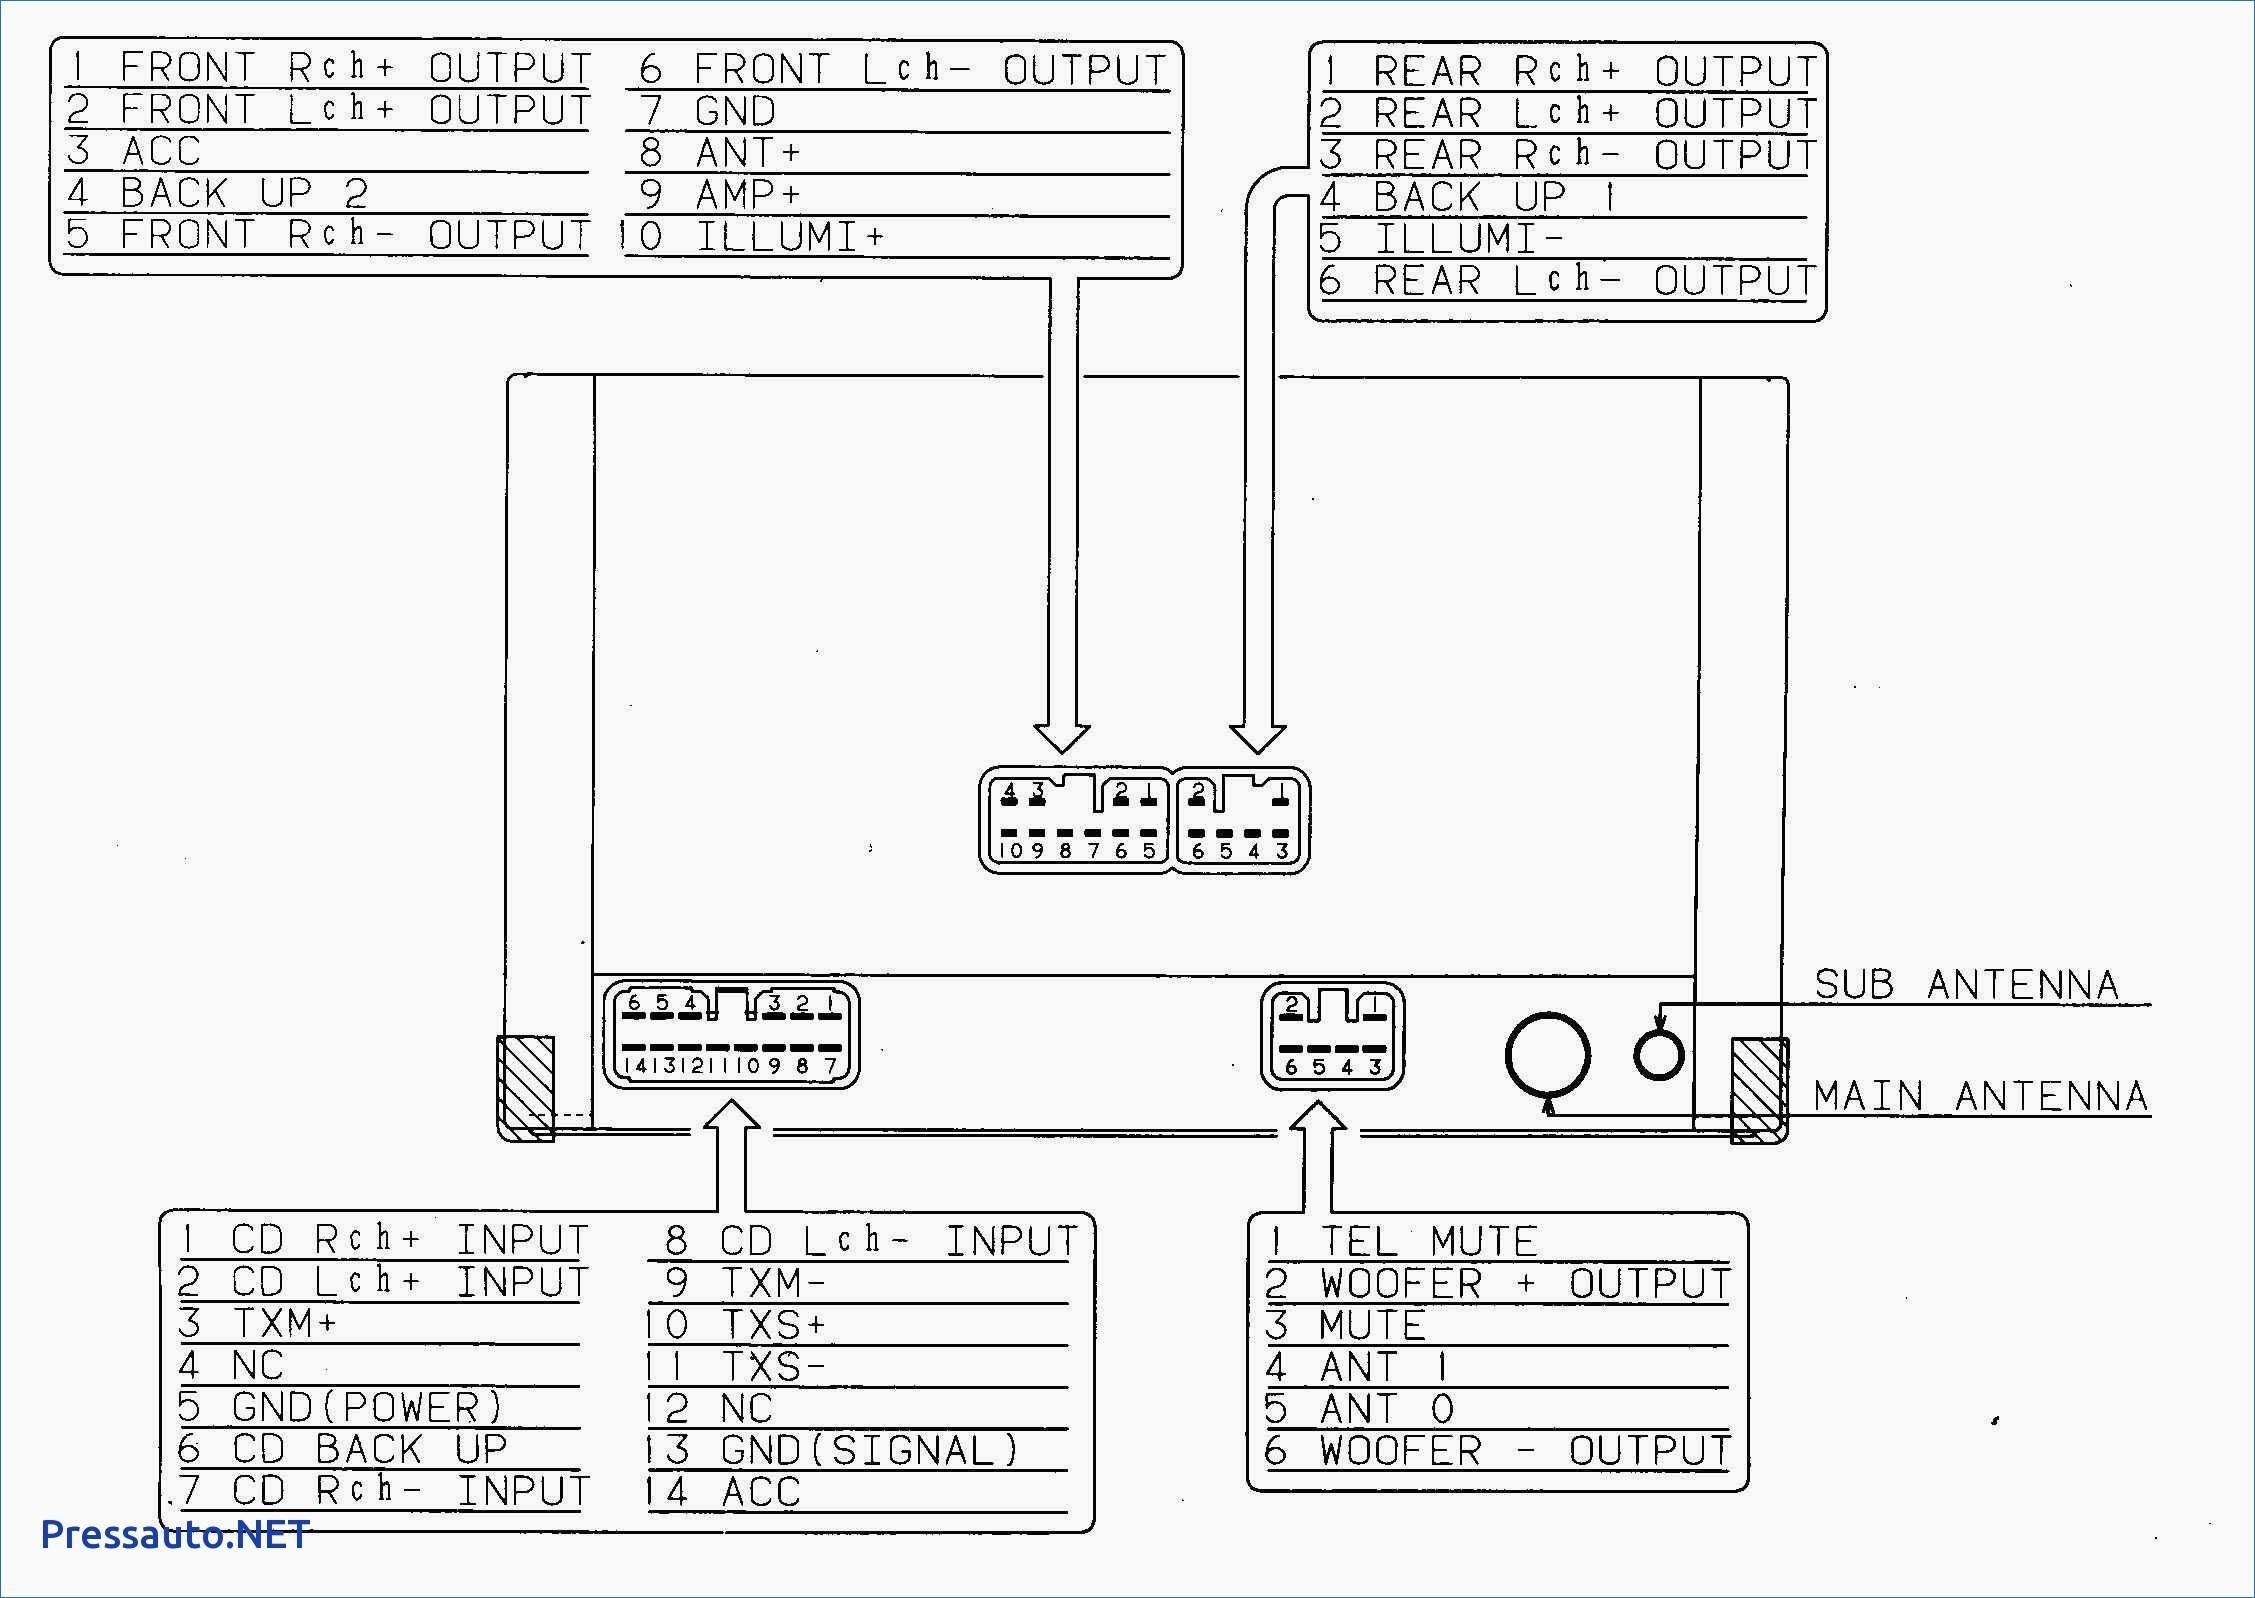 Wiring Diagram Pioneer Deh 150Mp | Manual E-Books - Pioneer Deh-150Mp Wiring Diagram